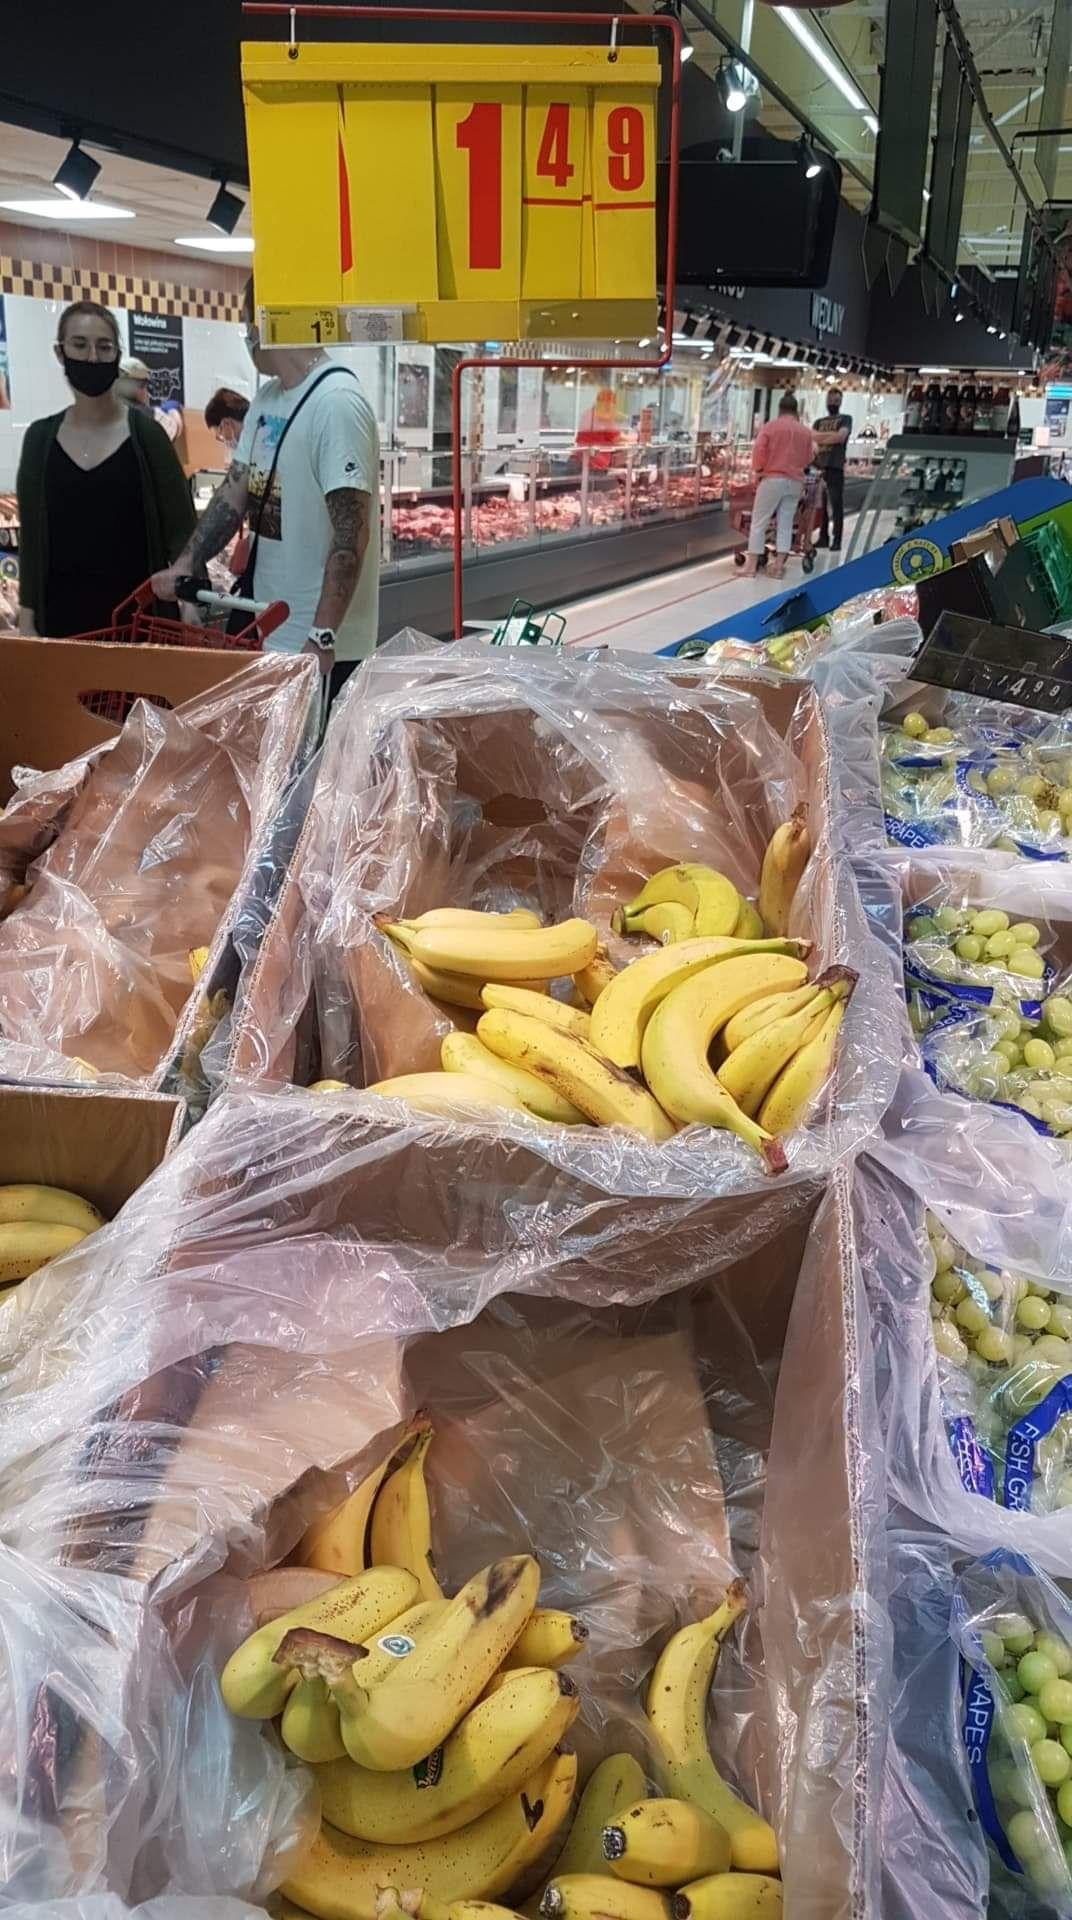 Banany 1.49/kg